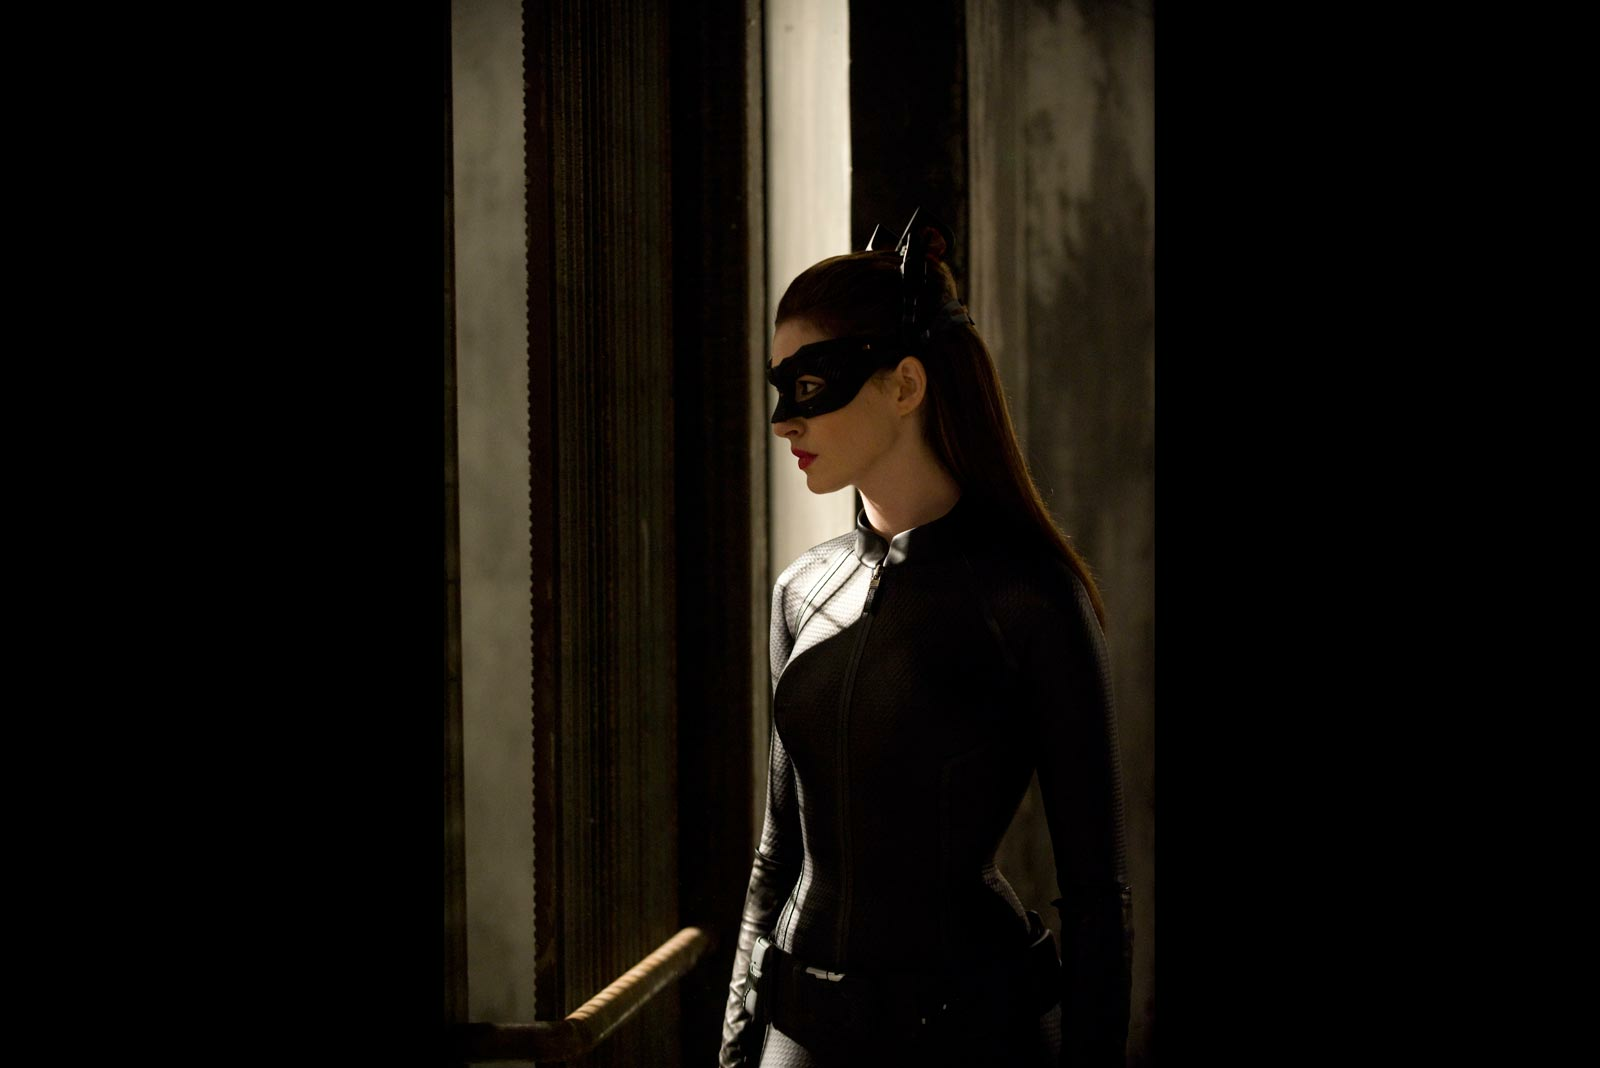 http://4.bp.blogspot.com/-3smvylNwF-U/UA8rBnzrLhI/AAAAAAAAMM0/J1ZxGXRMT9A/s1600/Dark+knight+Rises+Hathaway+Catwoman+%286%29.png